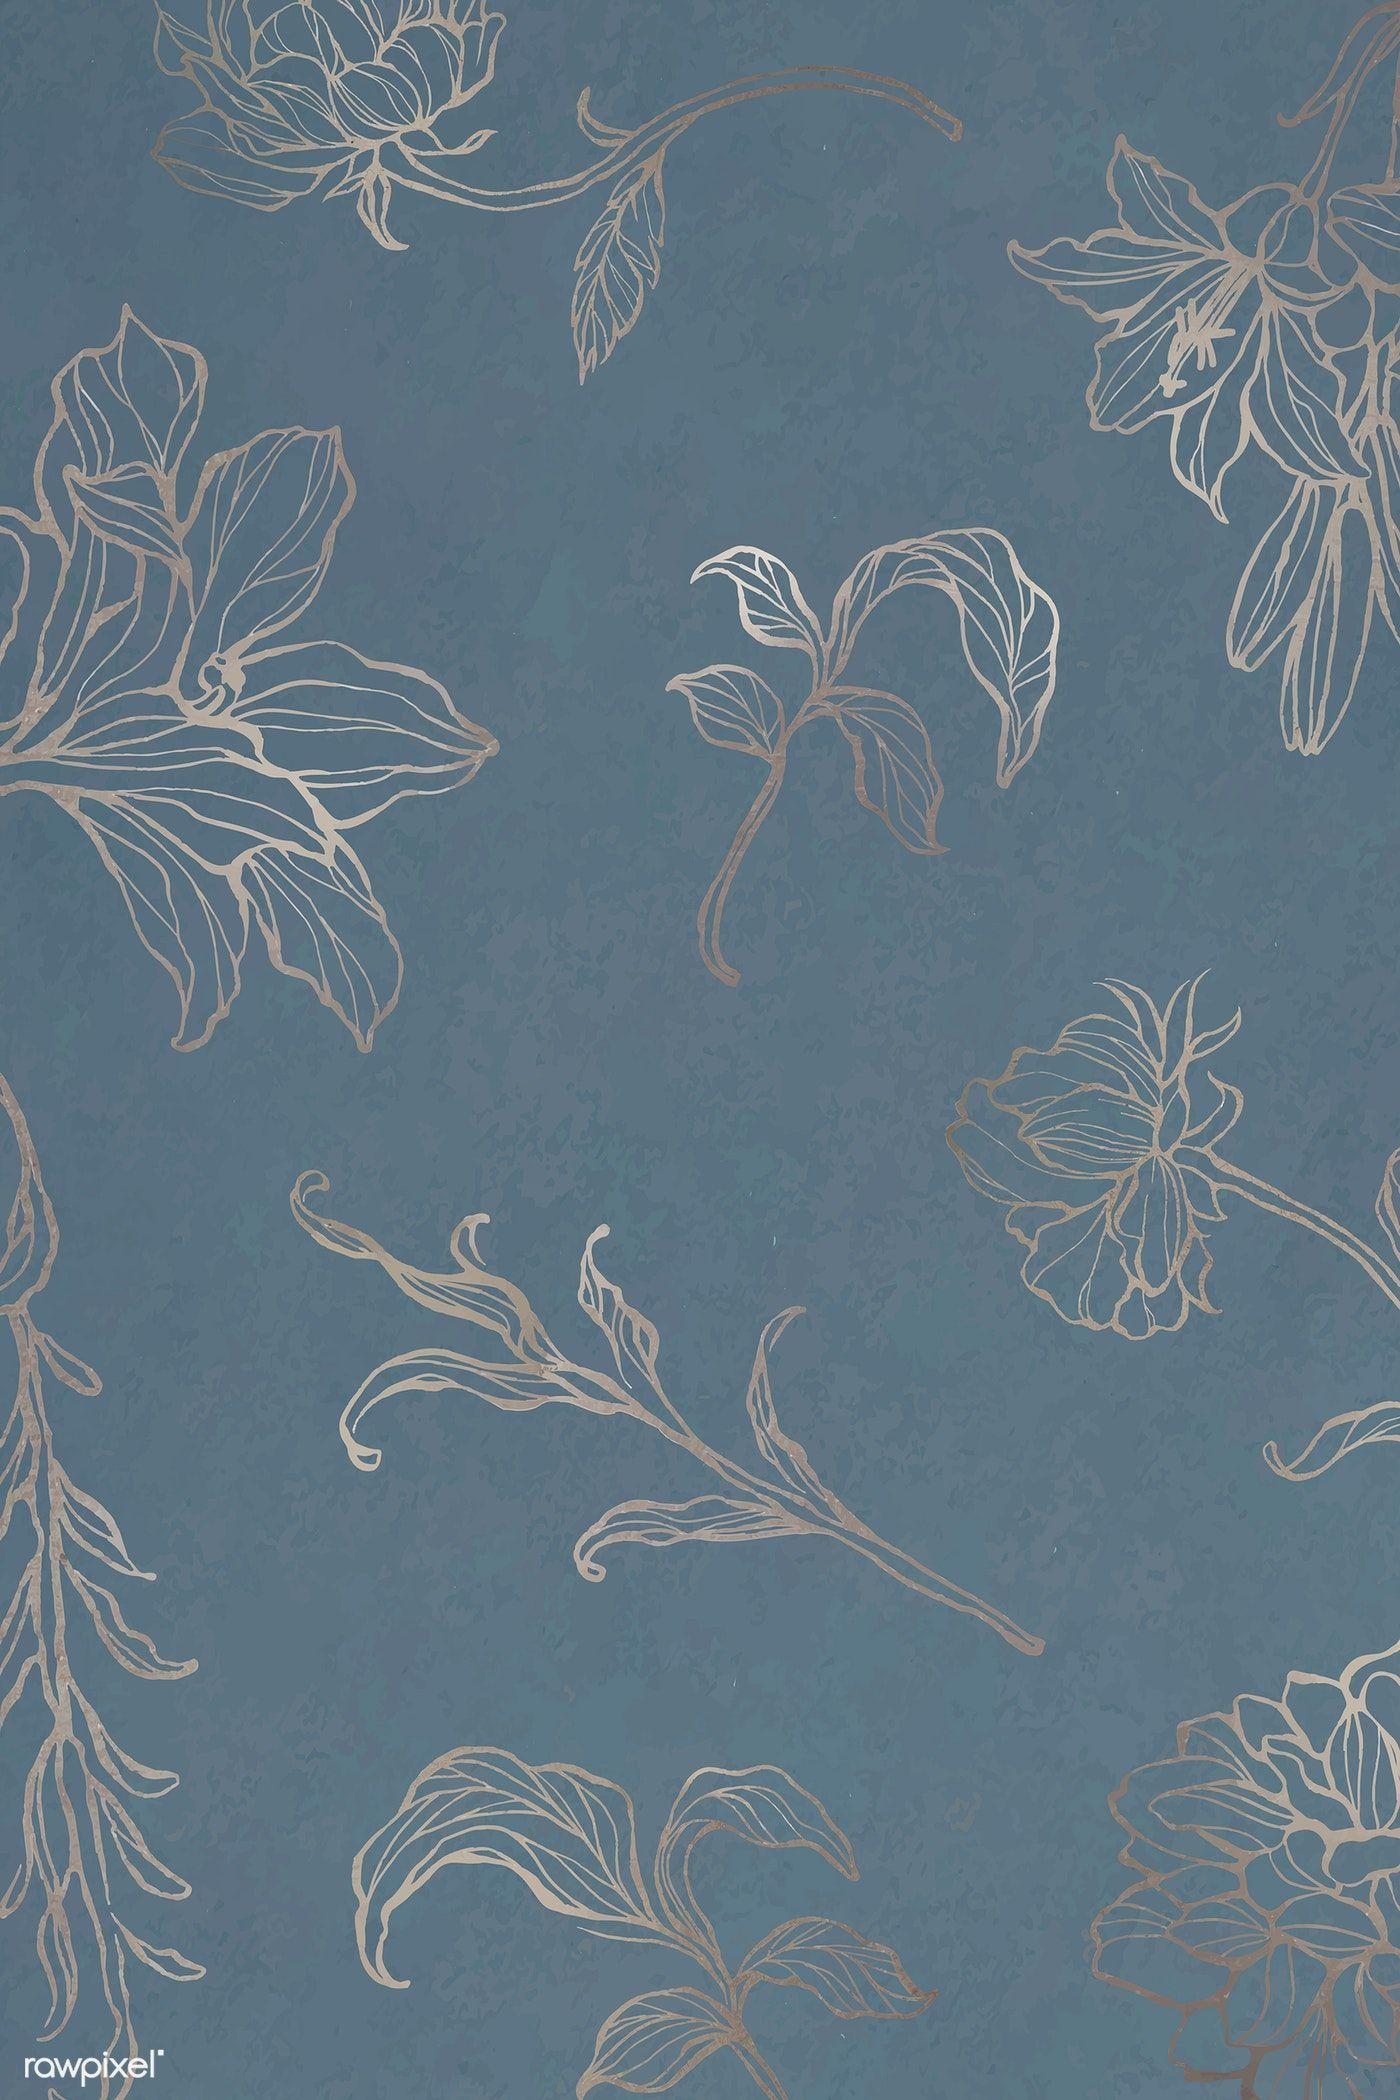 Download premium vector of Gold floral outline background